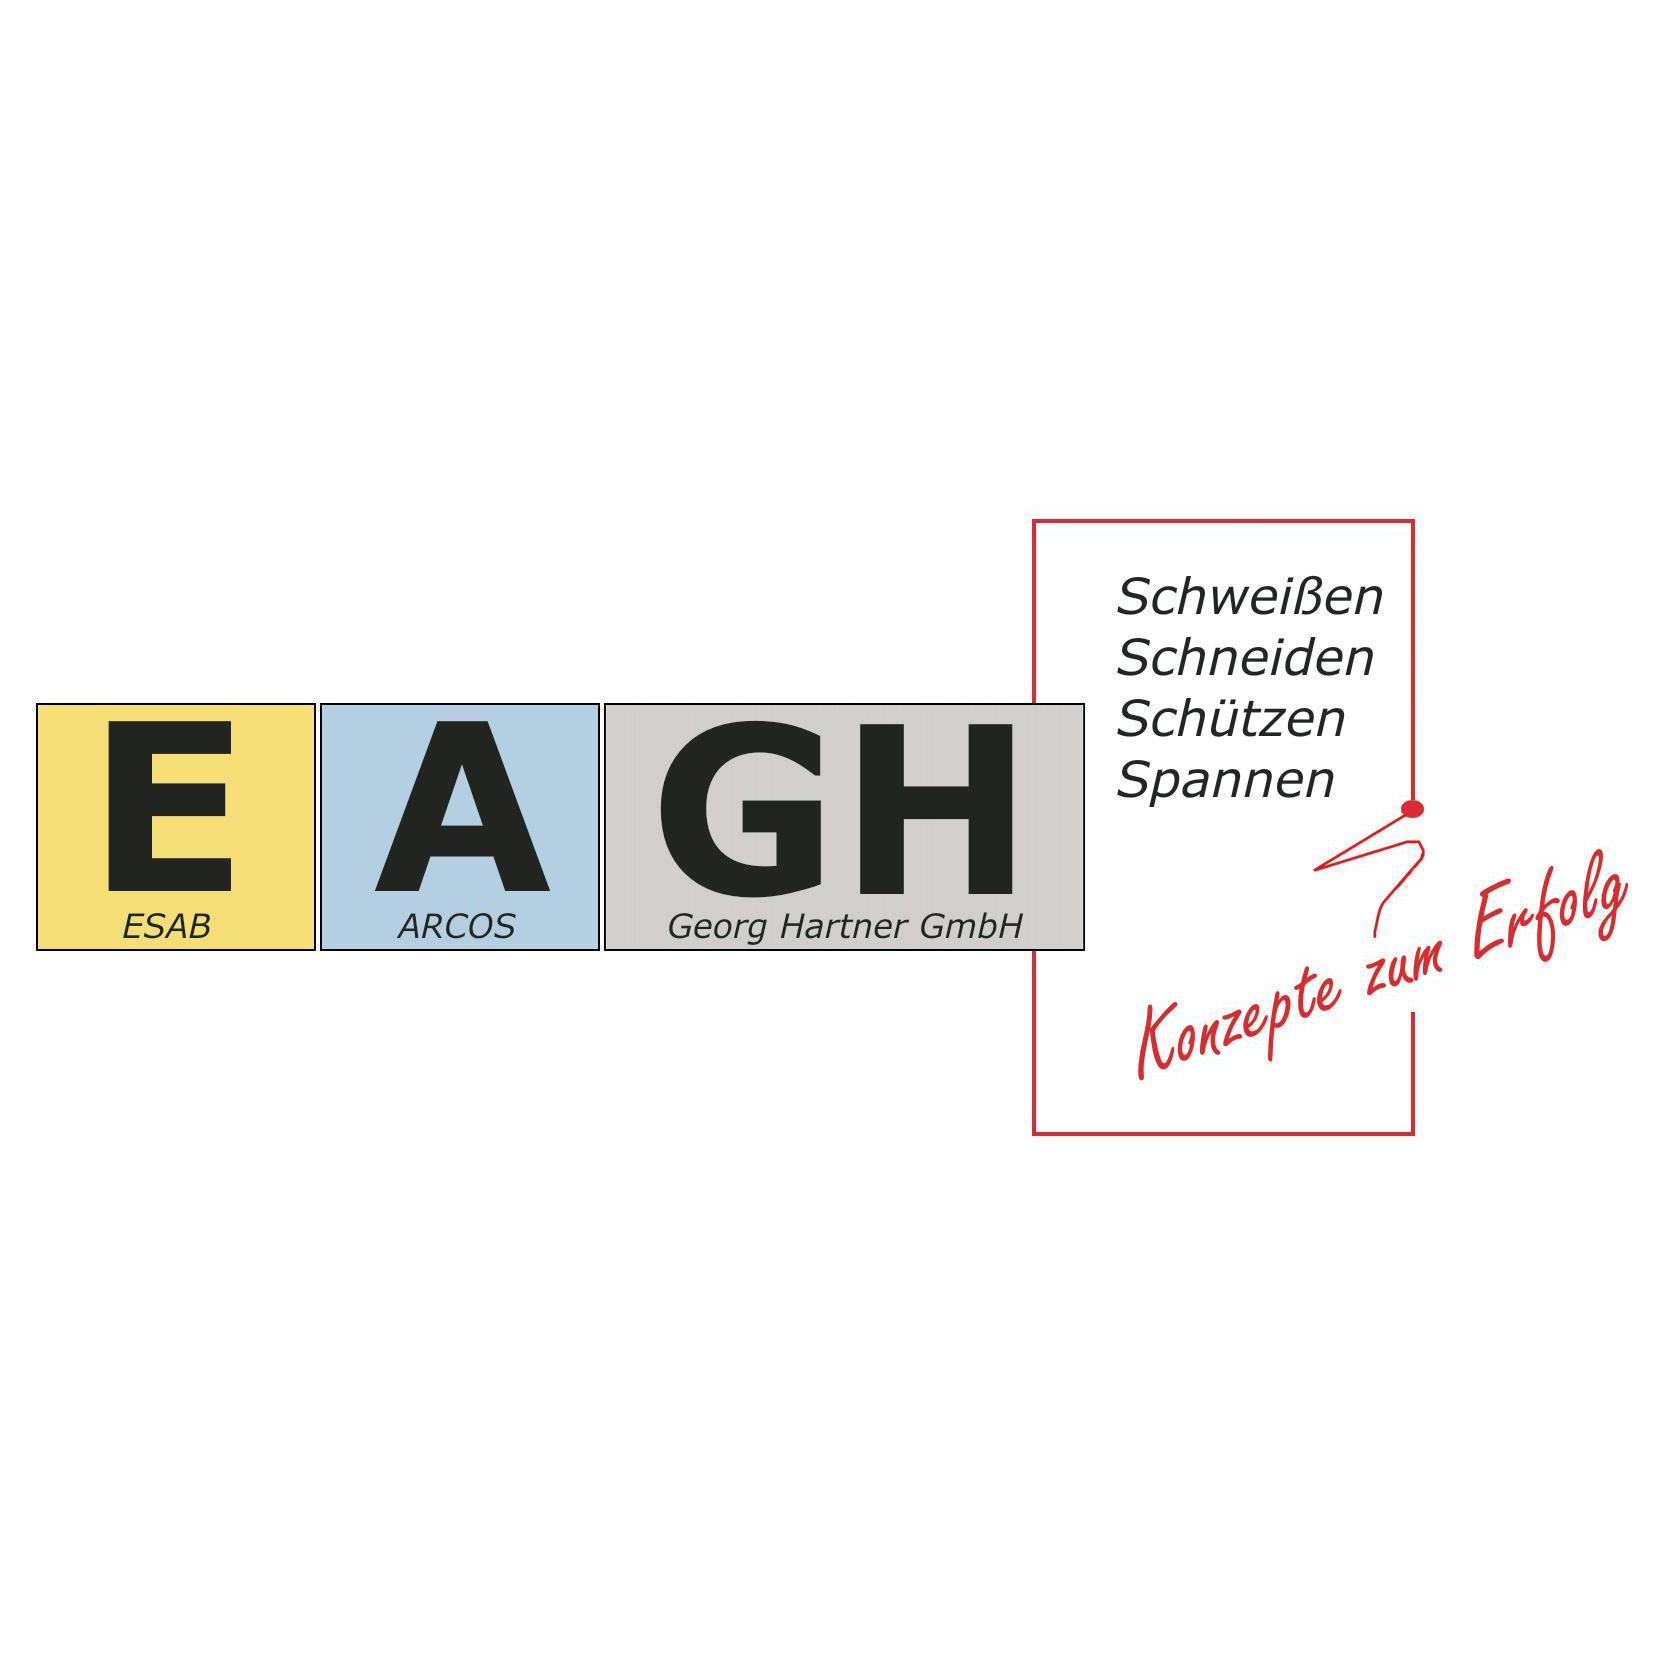 Bild zu ESAB-ARCOS-Georg Hartner GmbH in Nürnberg